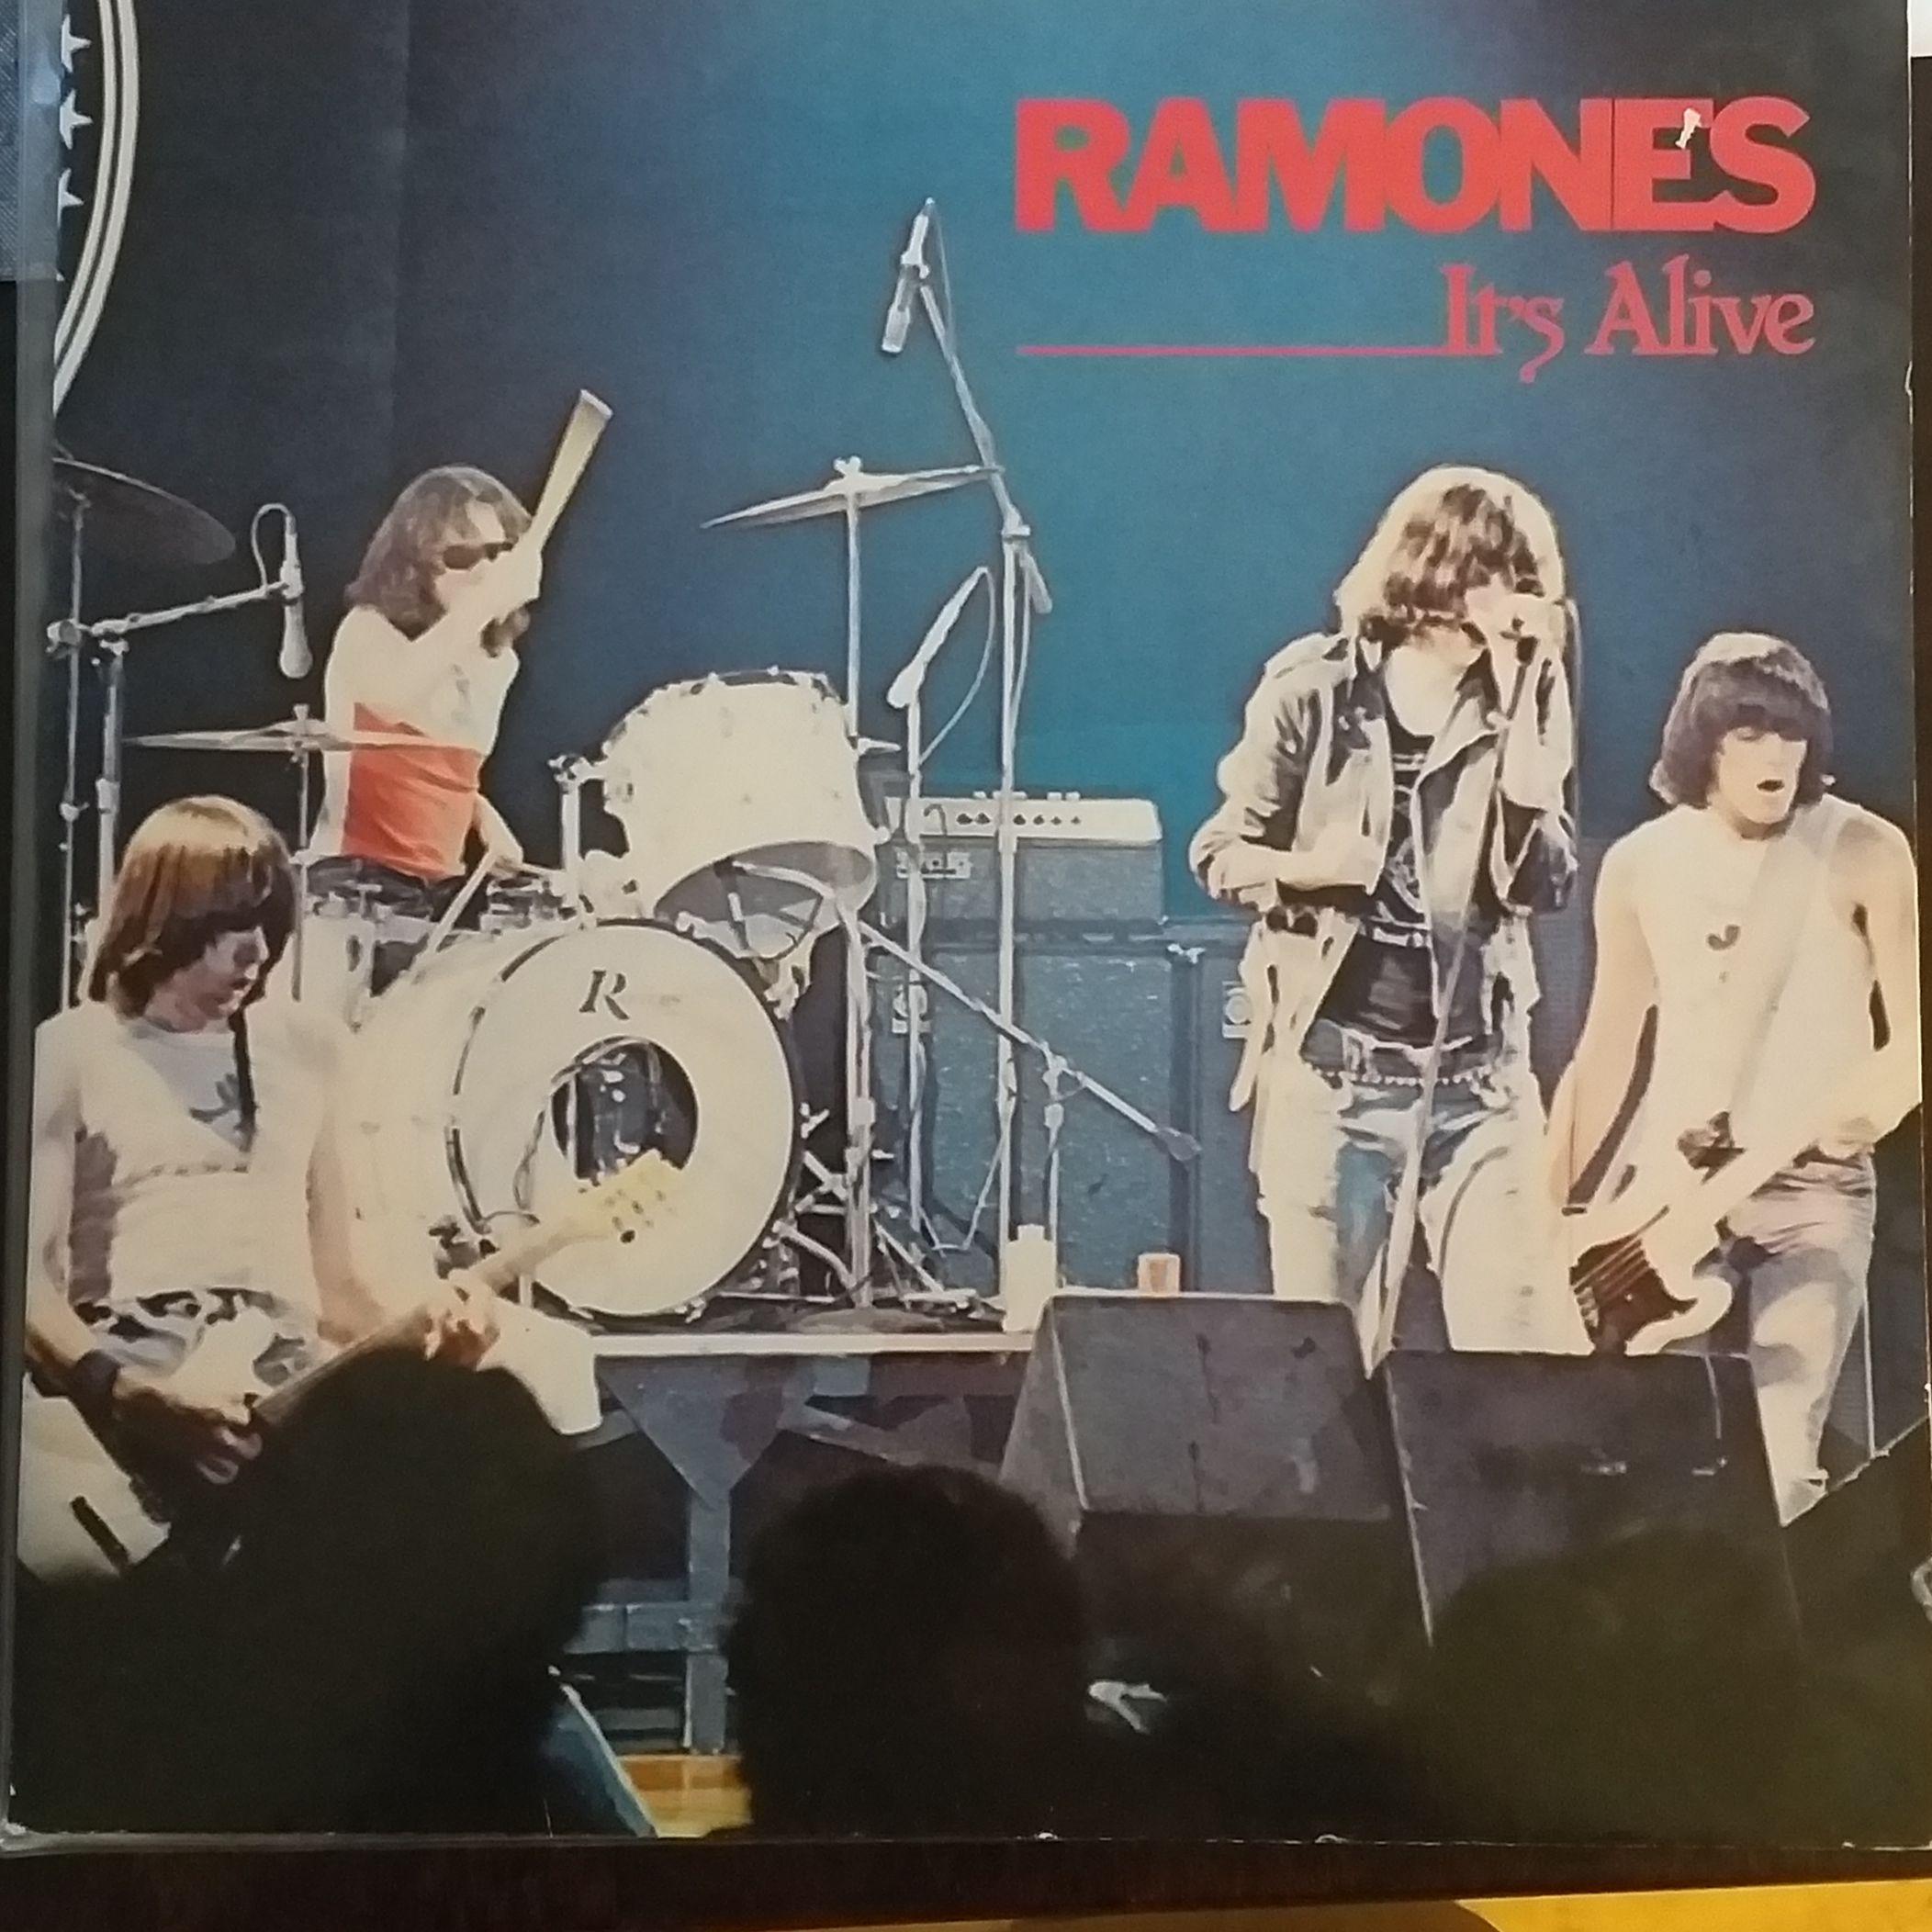 Ramones It's alive LP undefined